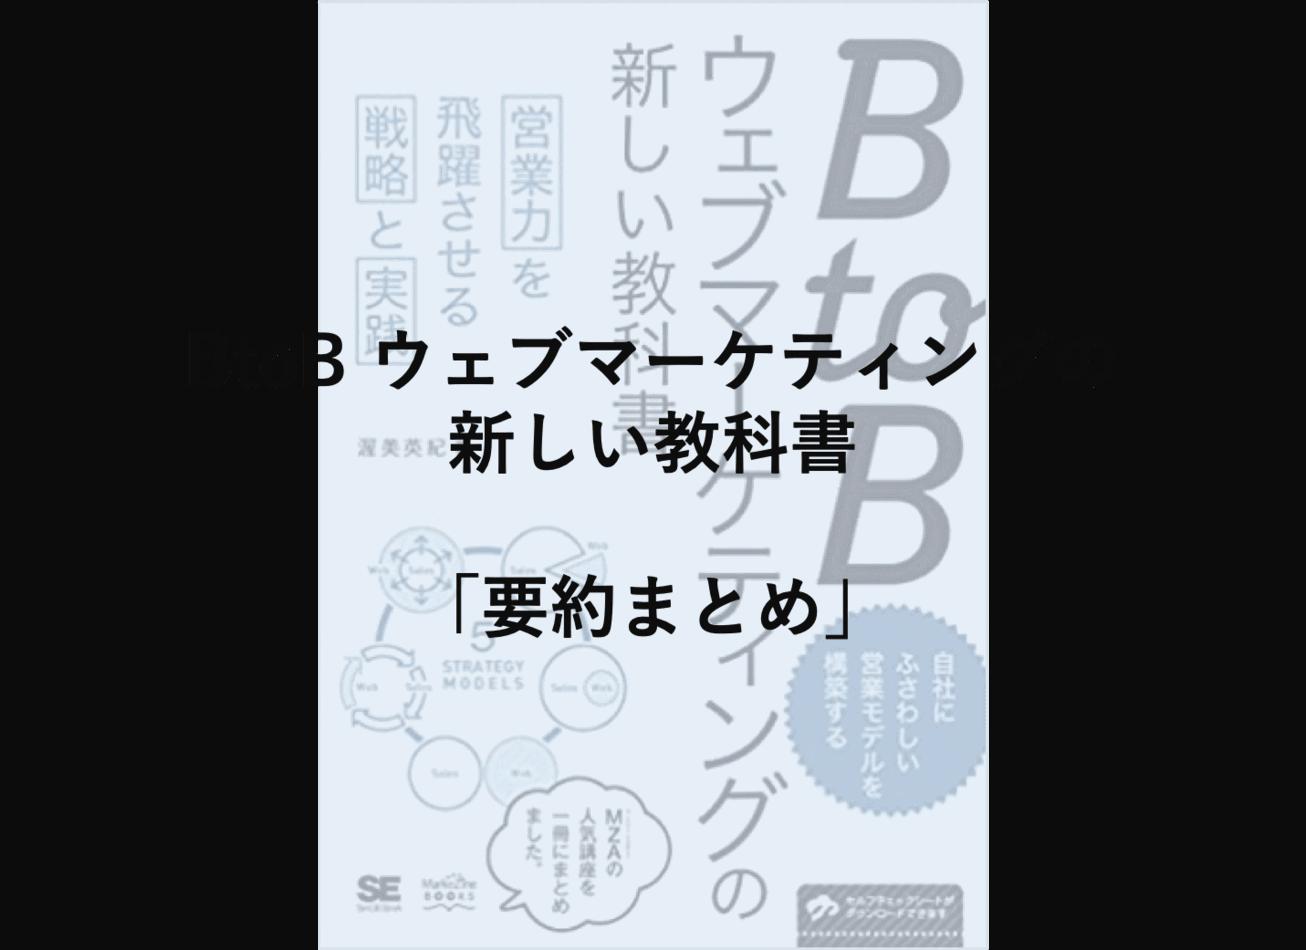 BtoBウェブマーケティングの新しい教科書の要約まとめ